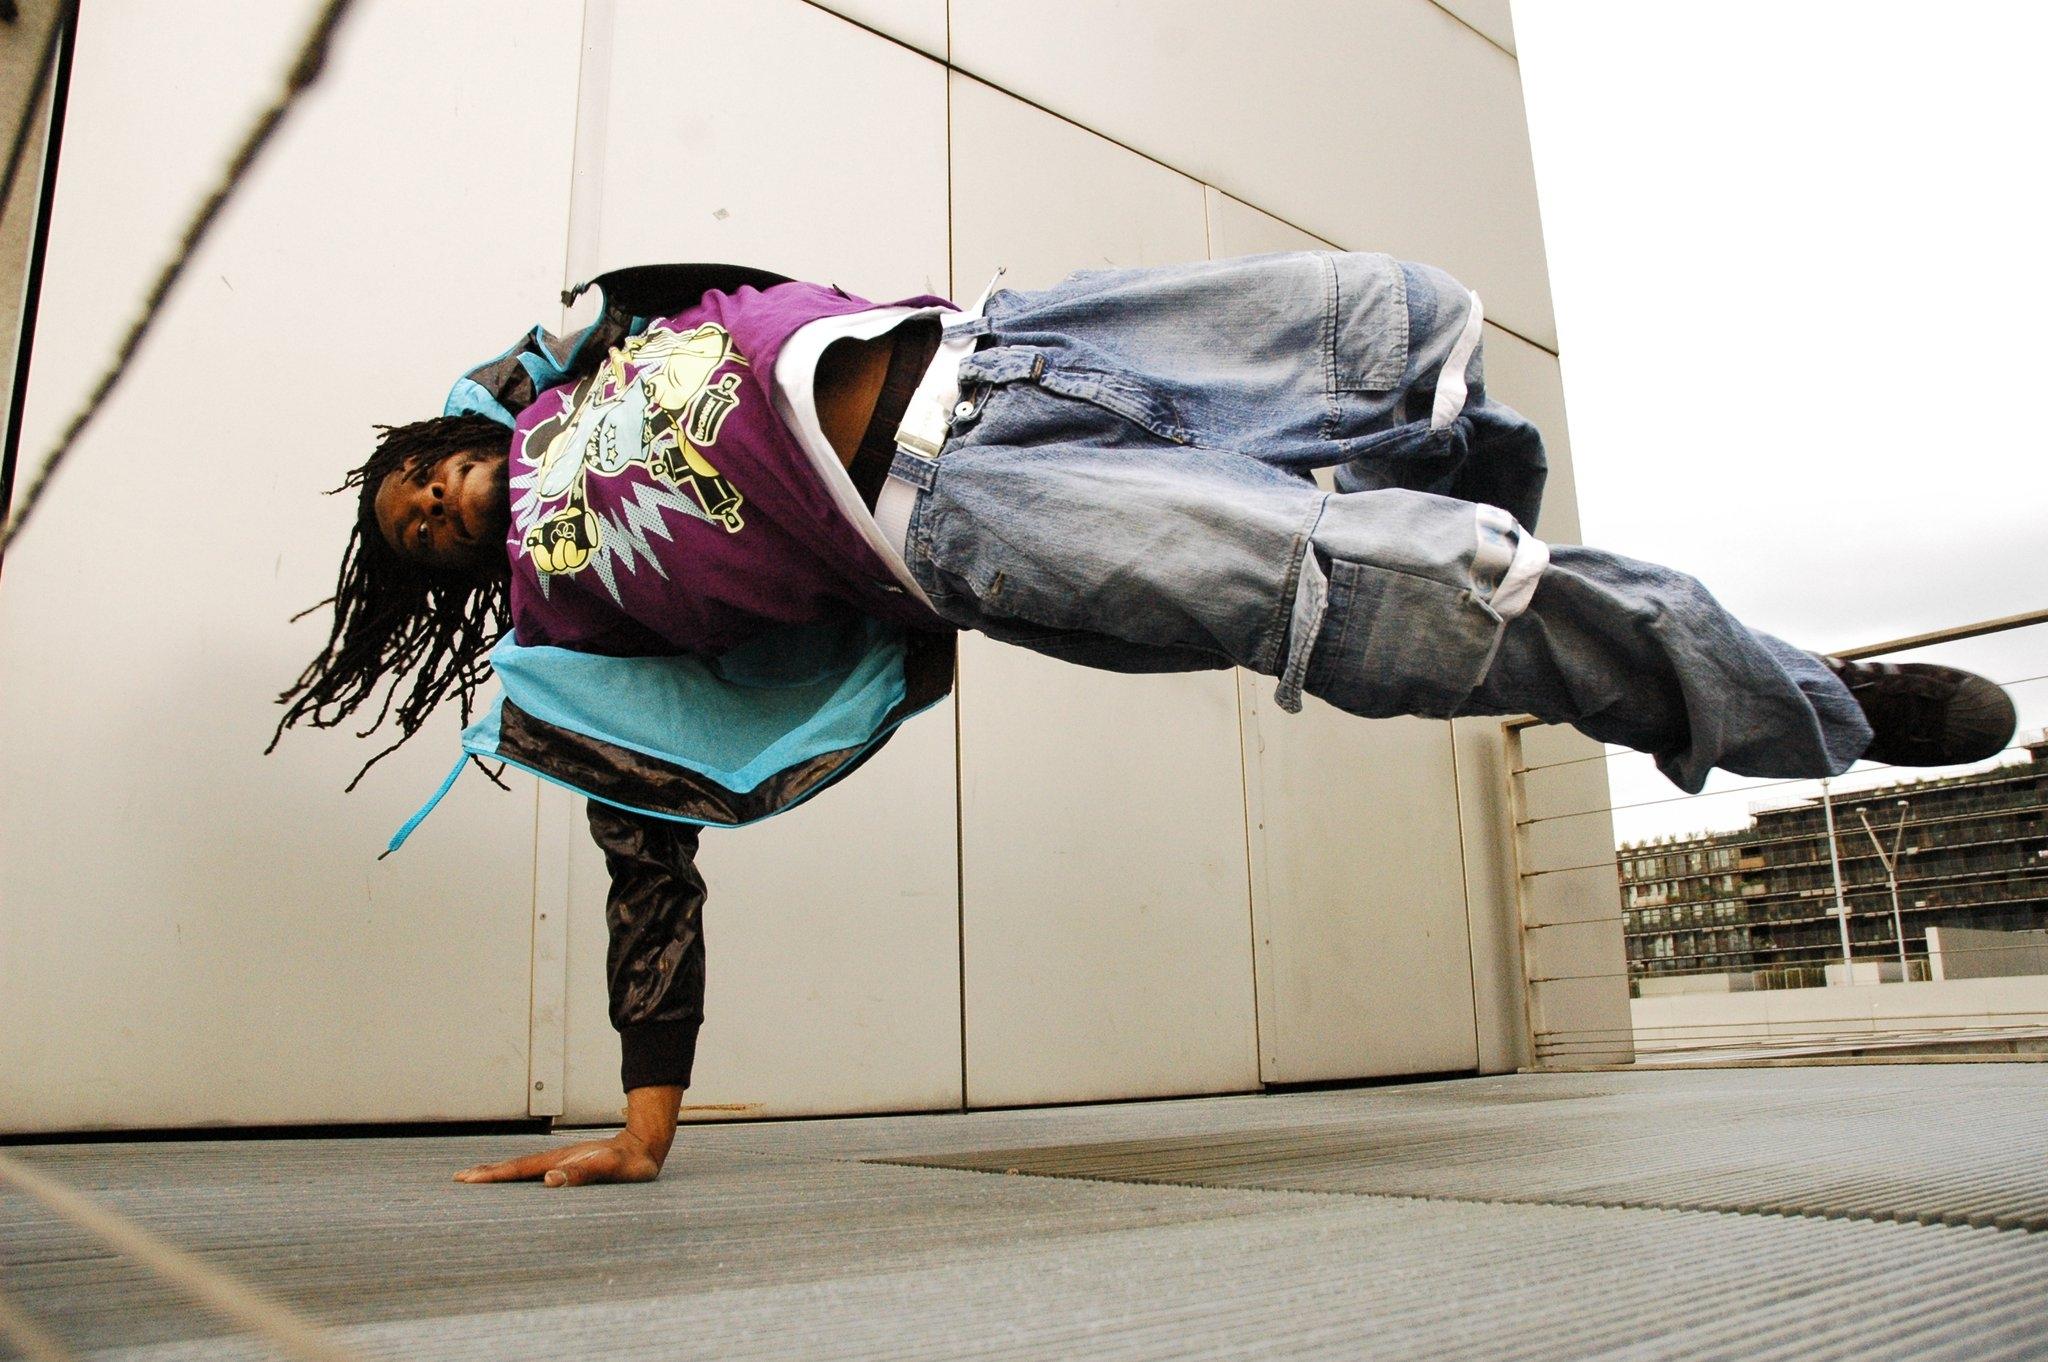 обрезка картинки в стиле хип хоп ребятами отправляемся